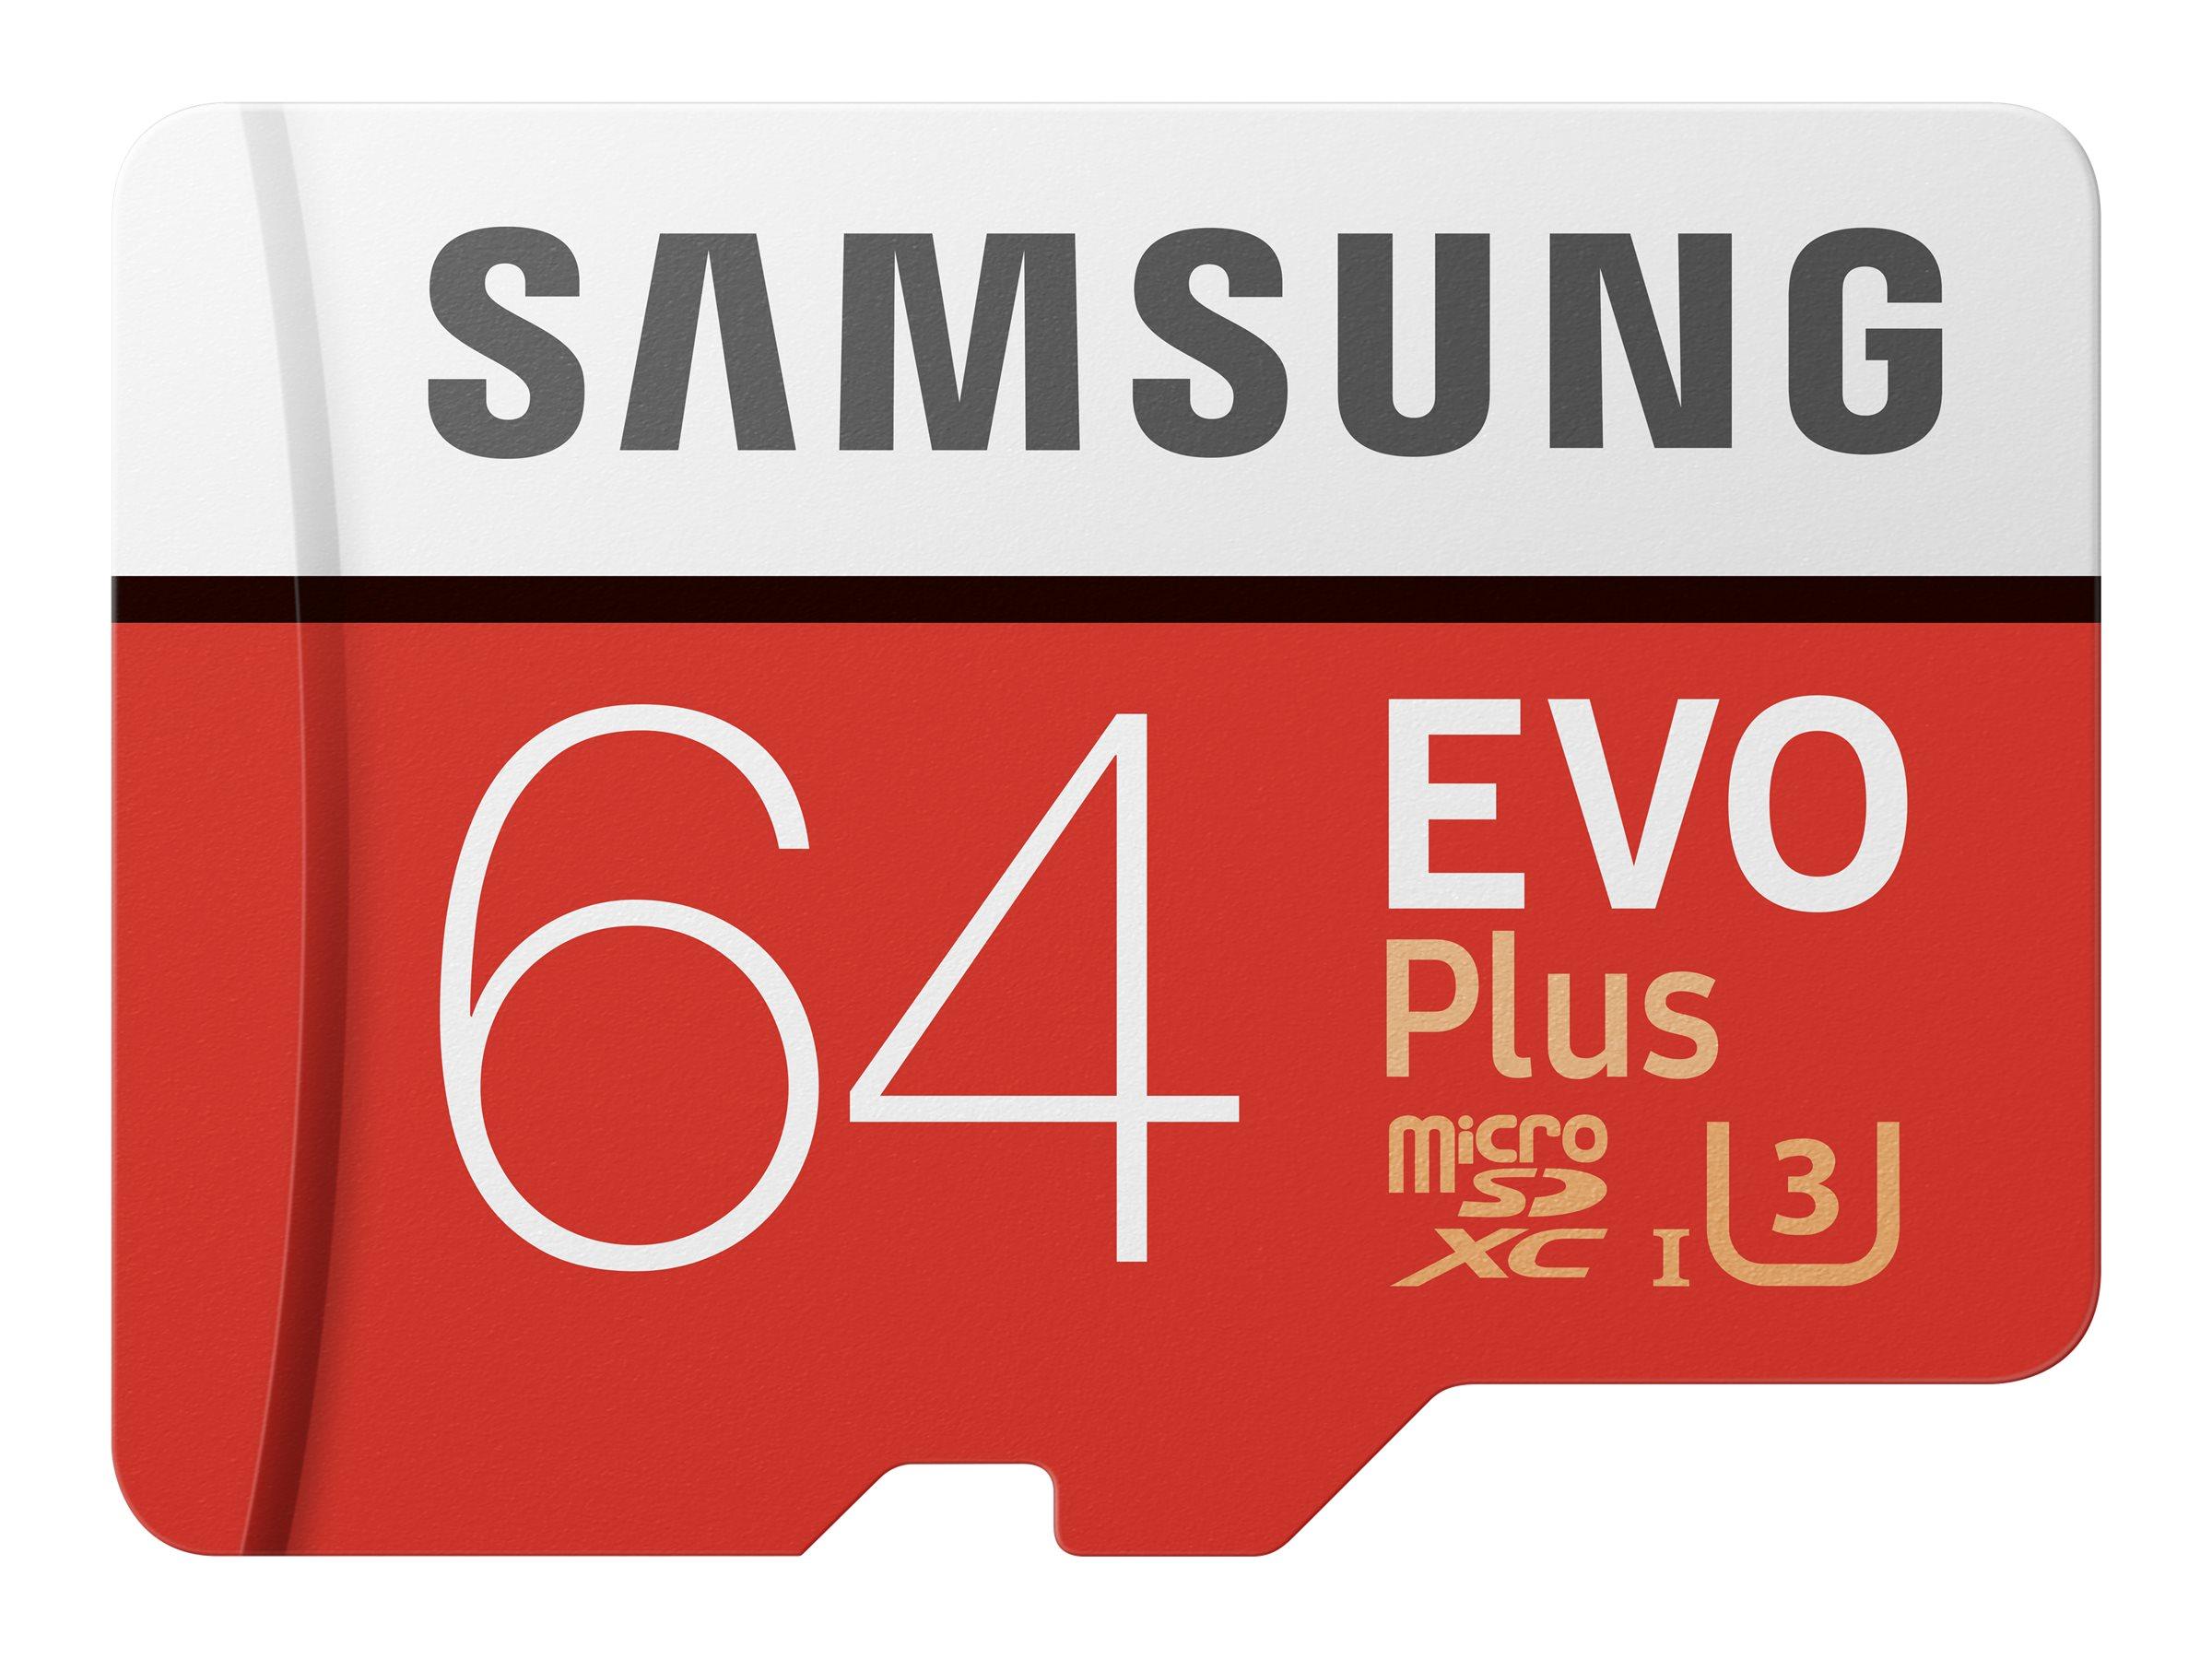 Samsung EVO Plus MB-MC64G - Flash-Speicherkarte (microSDXC-an-SD-Adapter inbegriffen) - 64 GB - UHS-I U3 / Class10 - microSDXC U